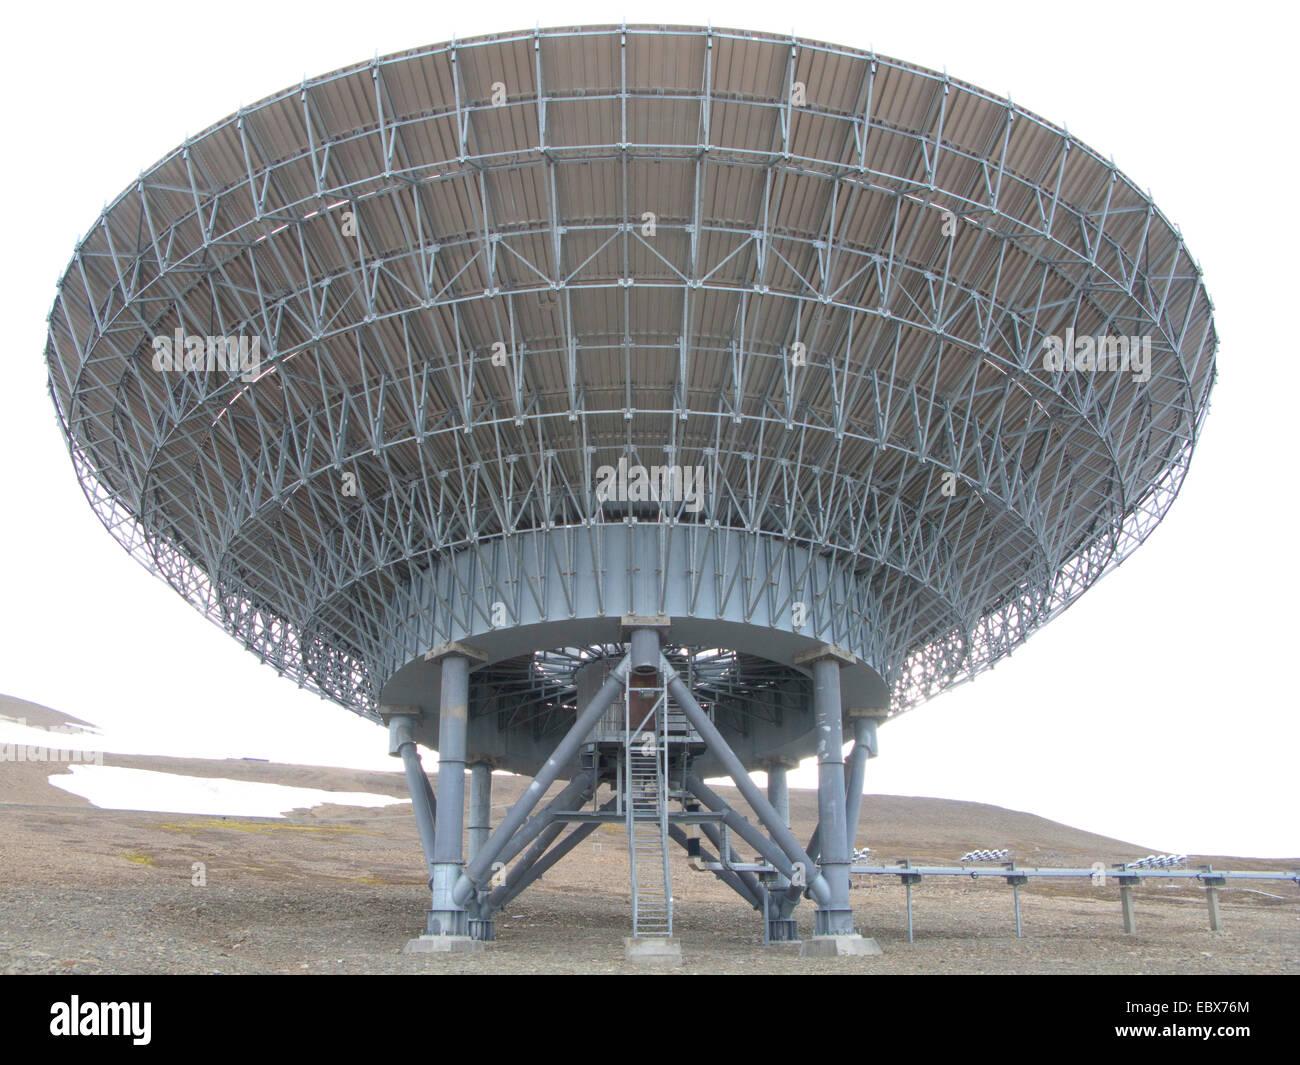 scientific radar system EISCAT, Norway, Svalbard, Longyearbyen - Stock Image